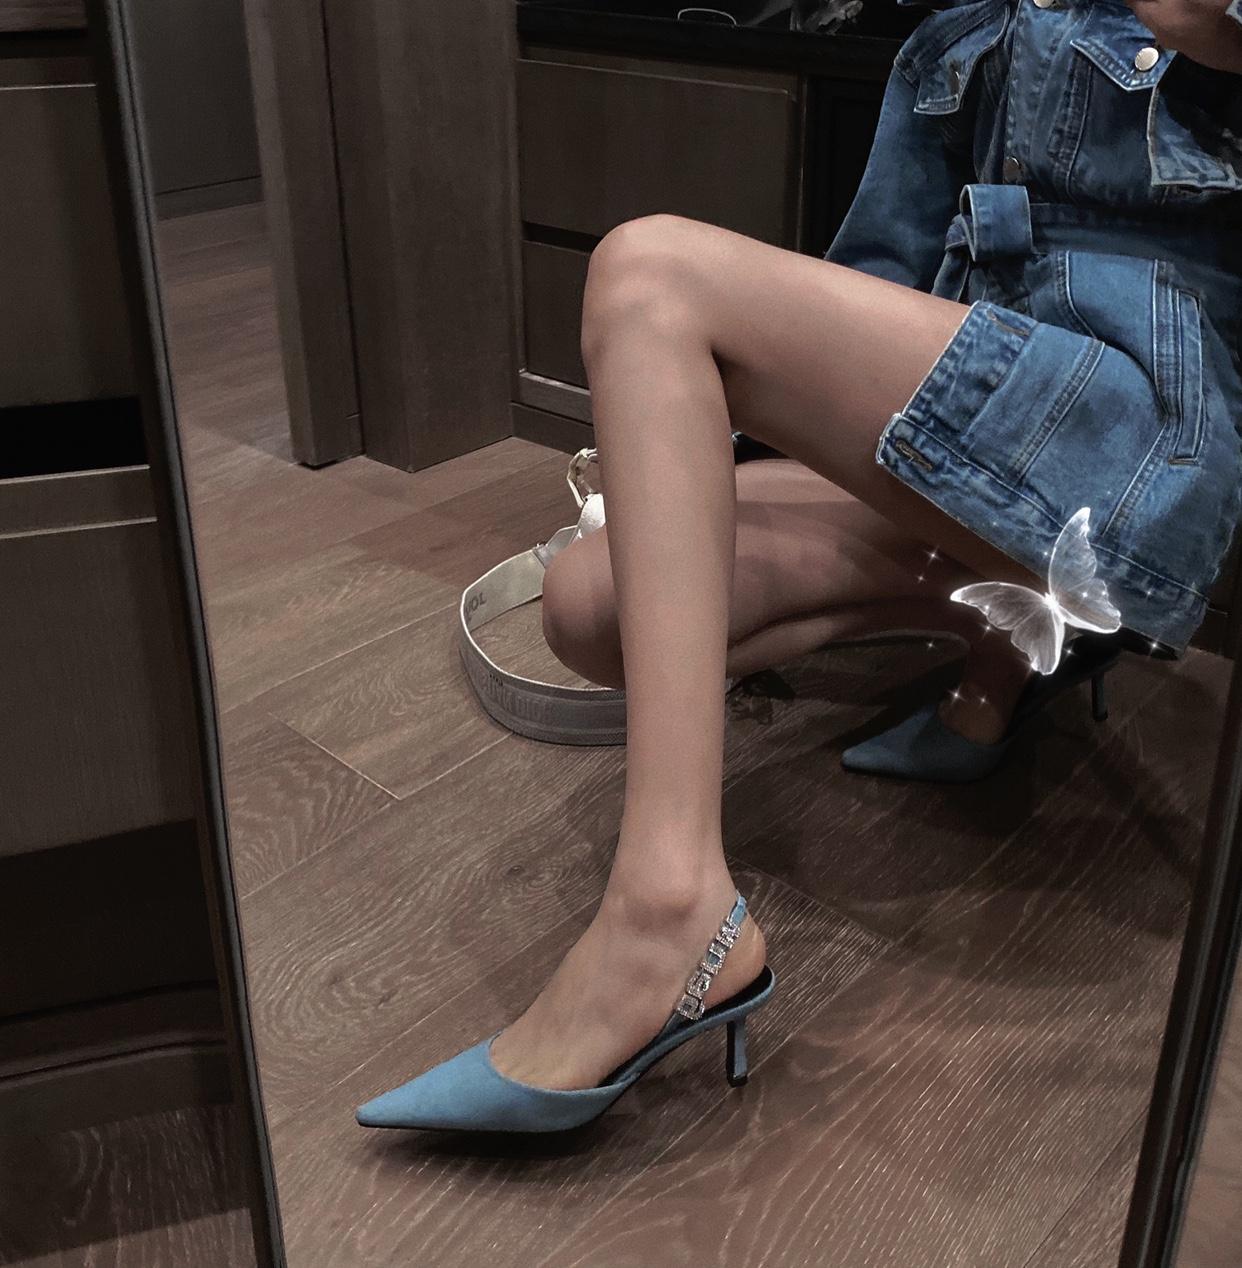 IN MIMIFACE 高跟鞋凉鞋 2020年新款尖头一字带牛仔布包头细跟女